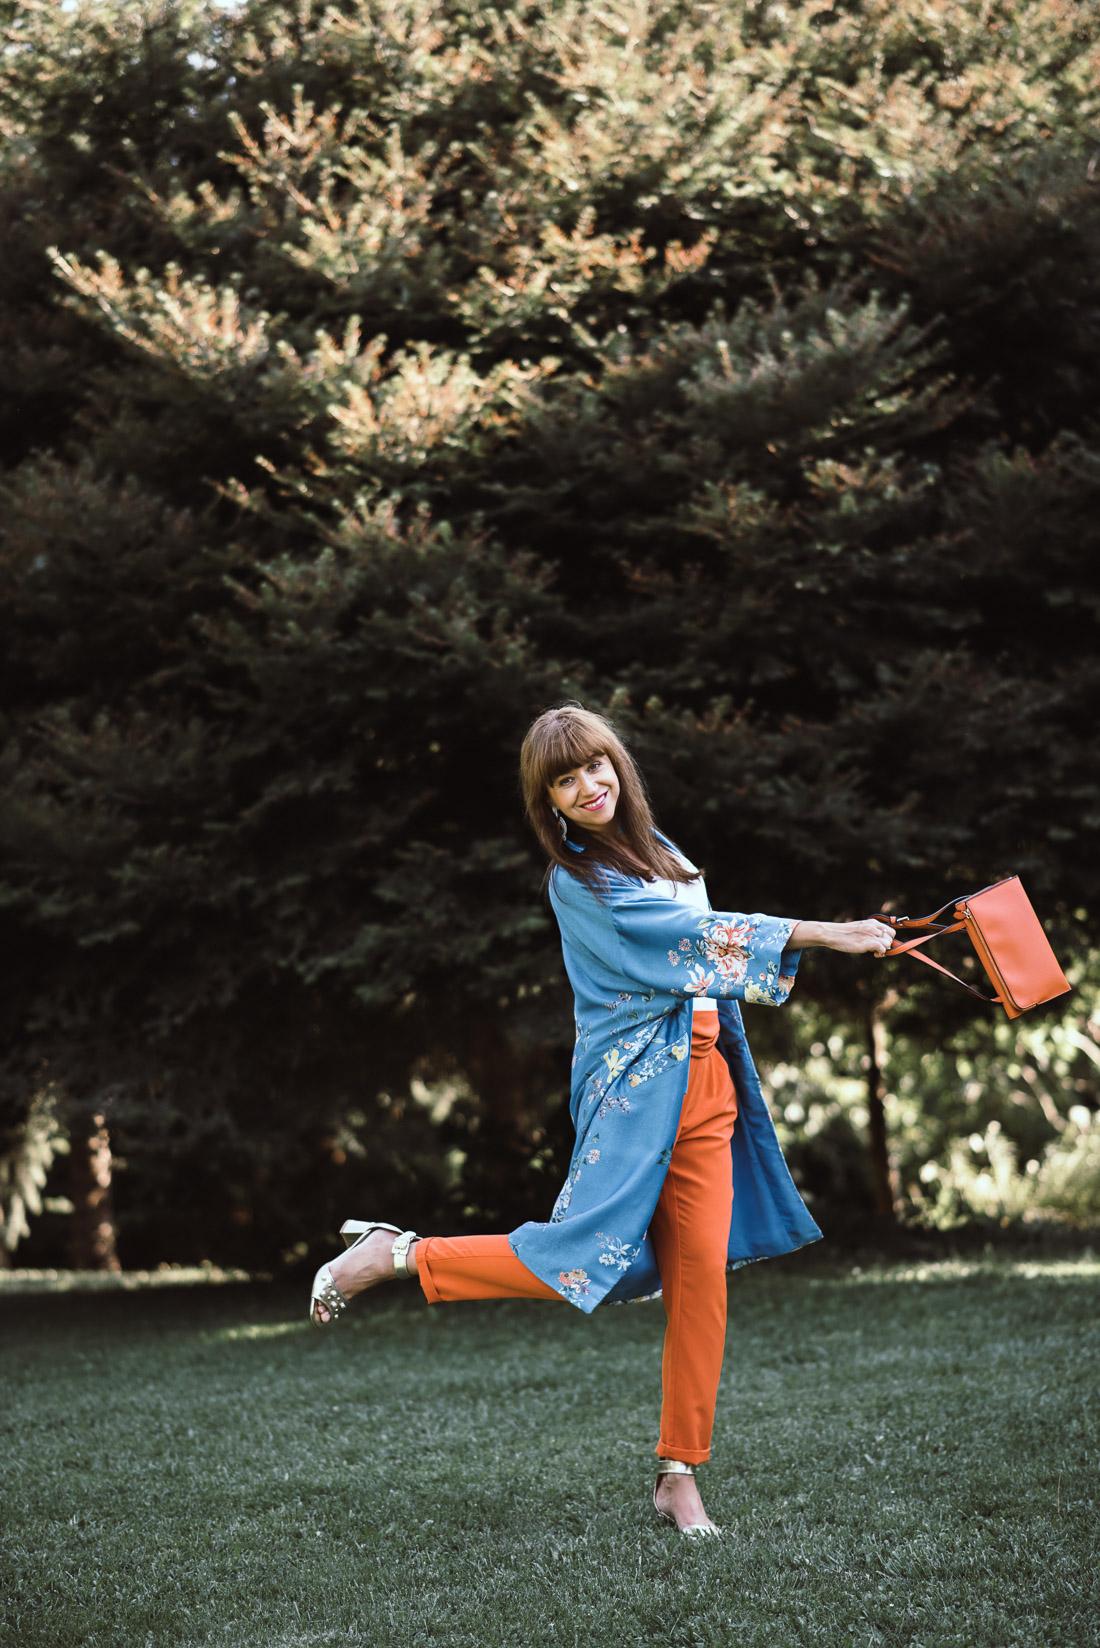 NOVÝ BYT, NOVÉ MOŽNOSTI_Katharine-fashion is beautiful_blog 6_Náušnice Bazu_Kvetinové kimono ZARA_Katarína Jakubčová_fashion blogerka